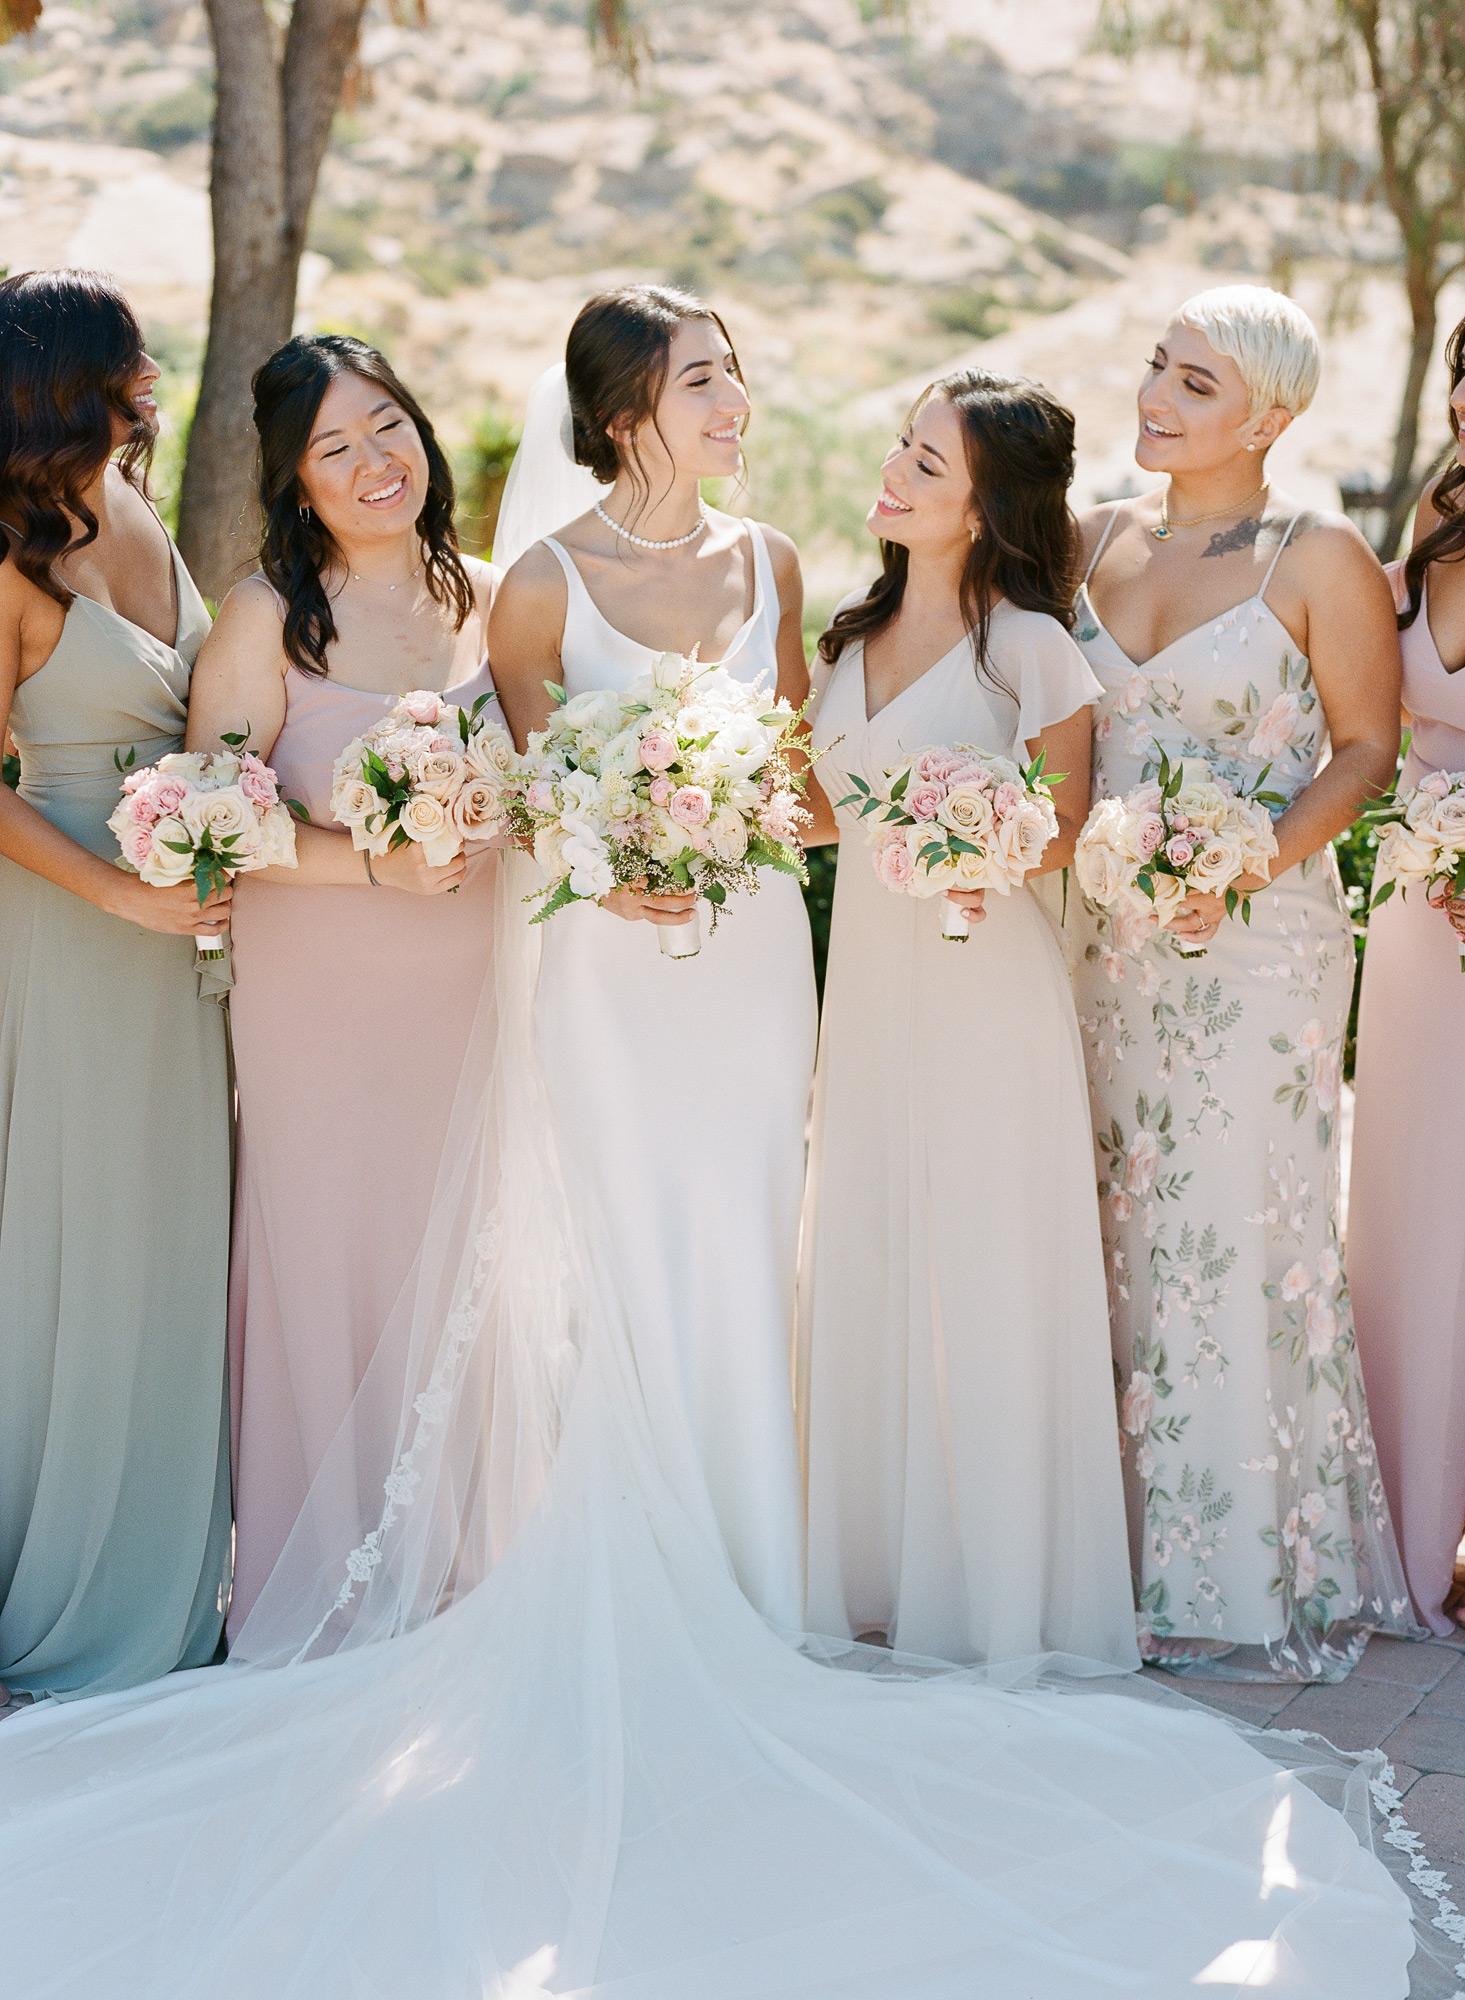 Sasha with bridesmaids